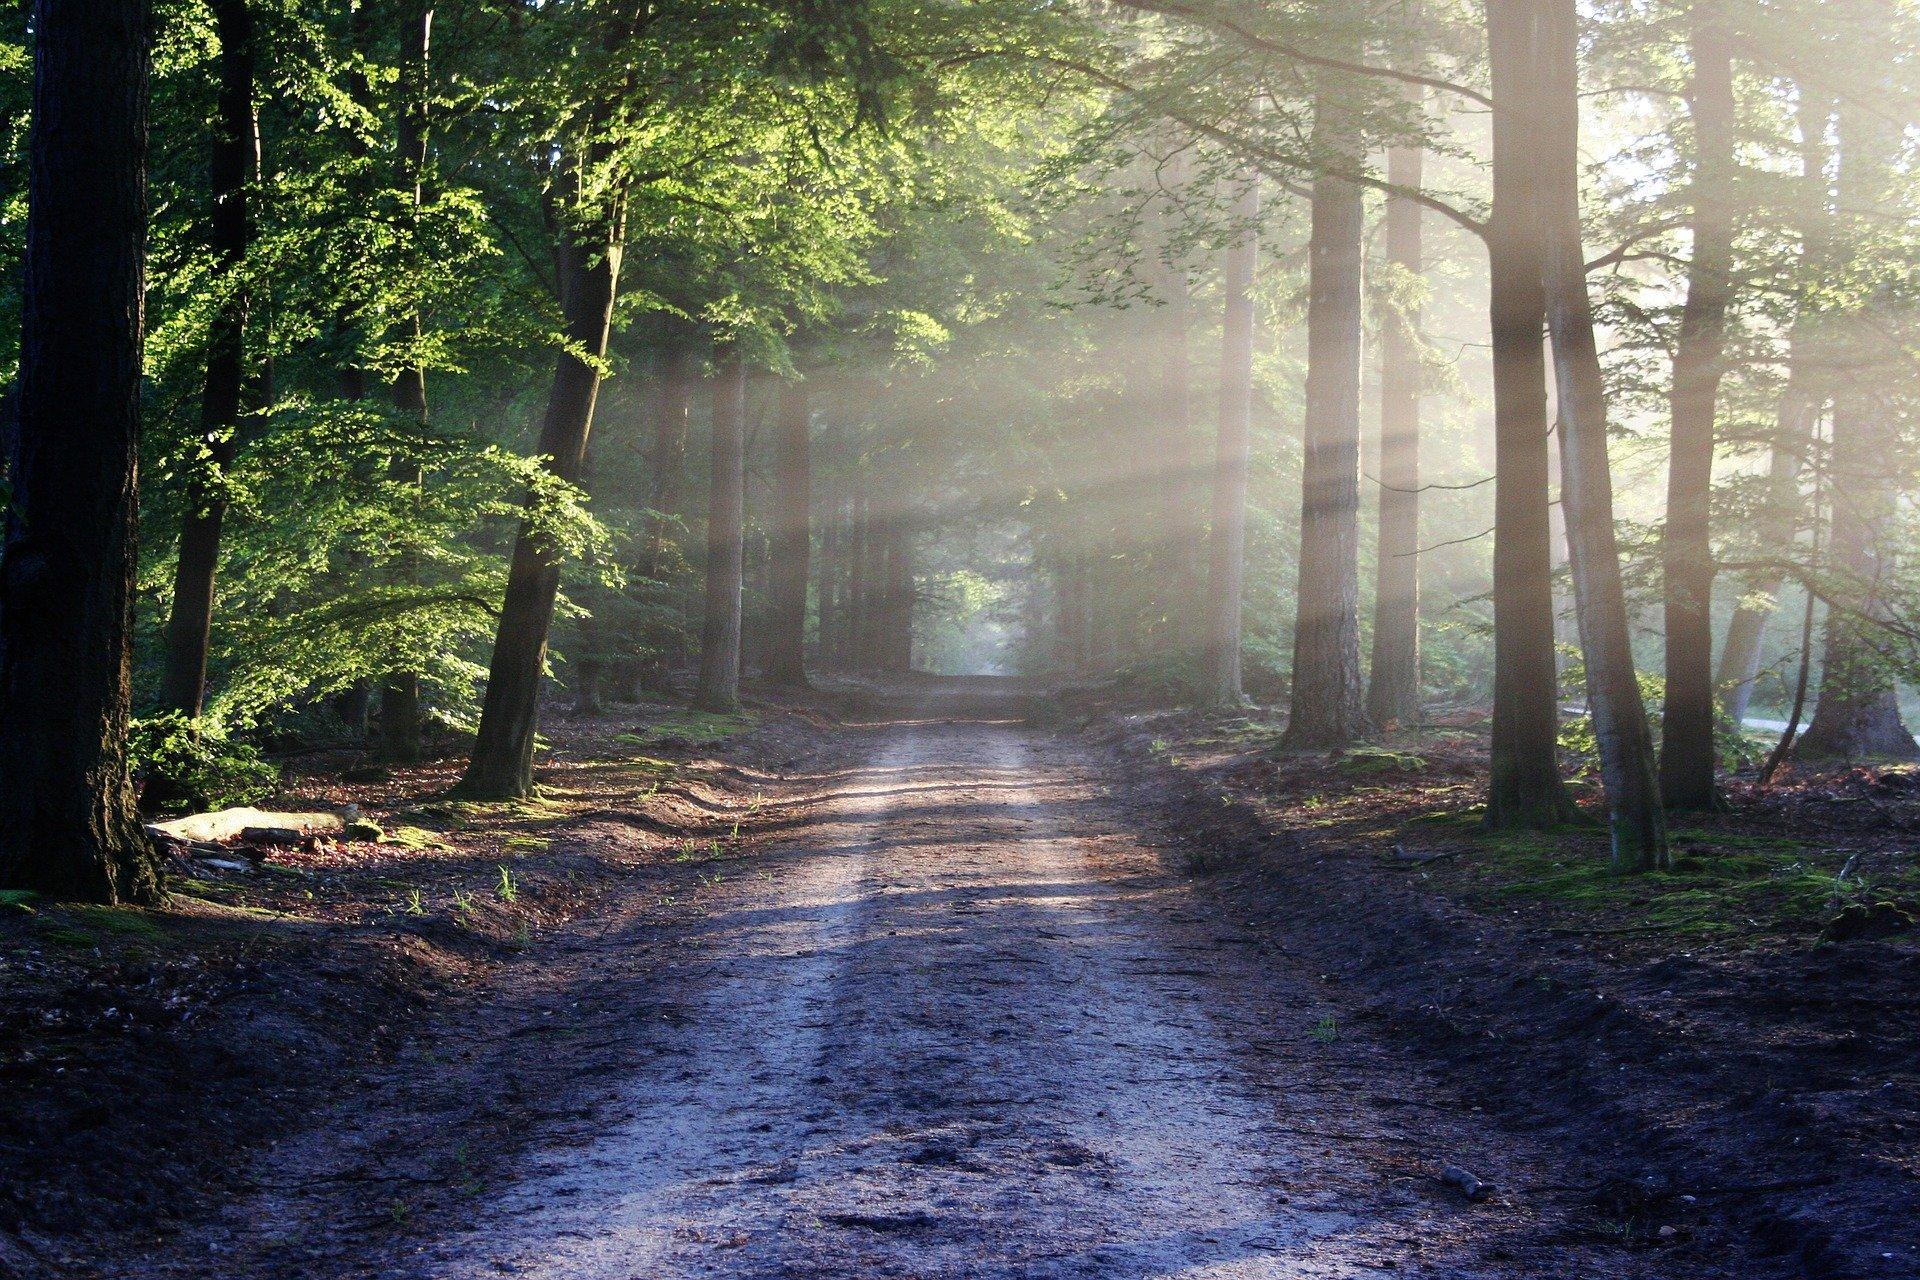 the-road-815297_1920-1588234290457.jpg